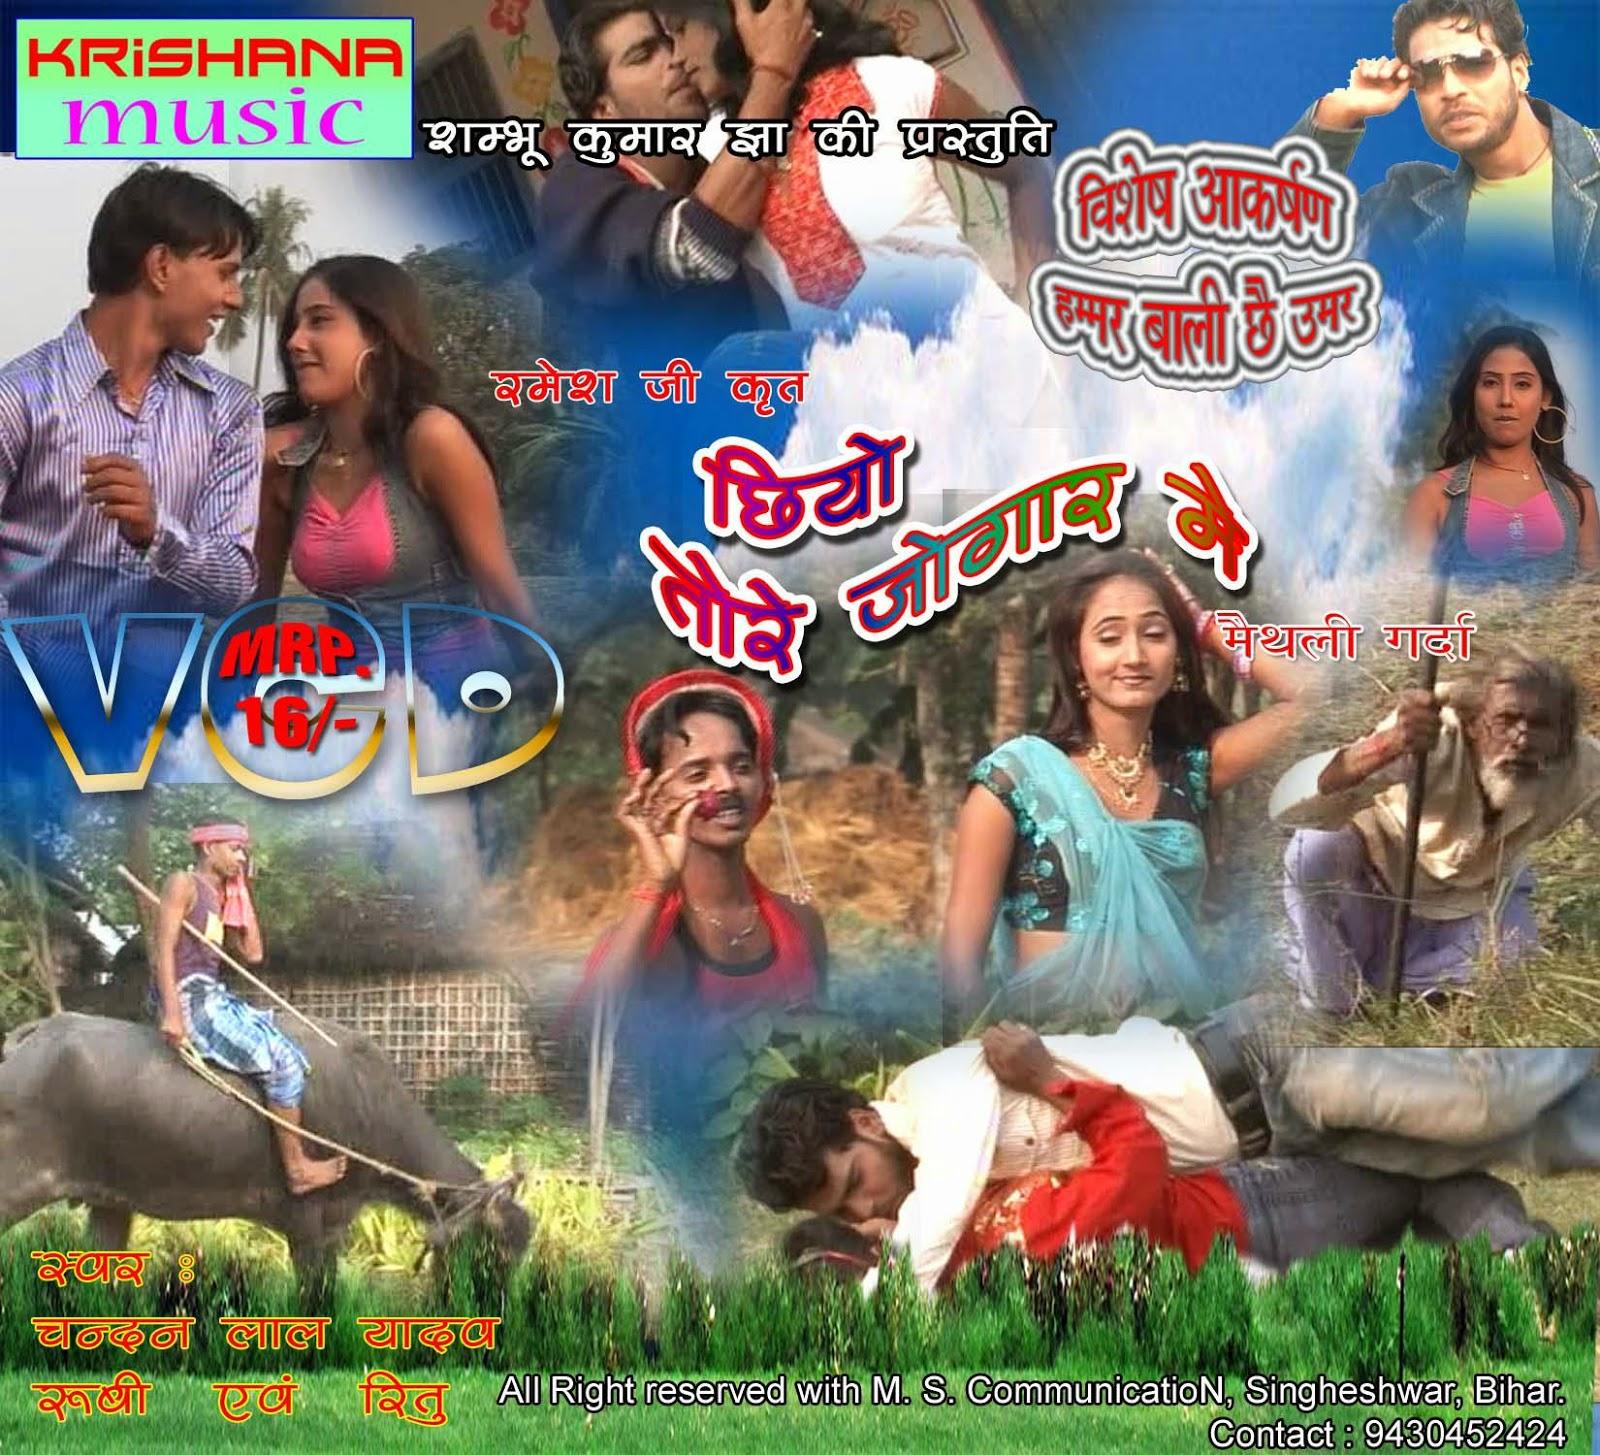 chhiyo tore jogar me _ www.krishanamusic.com